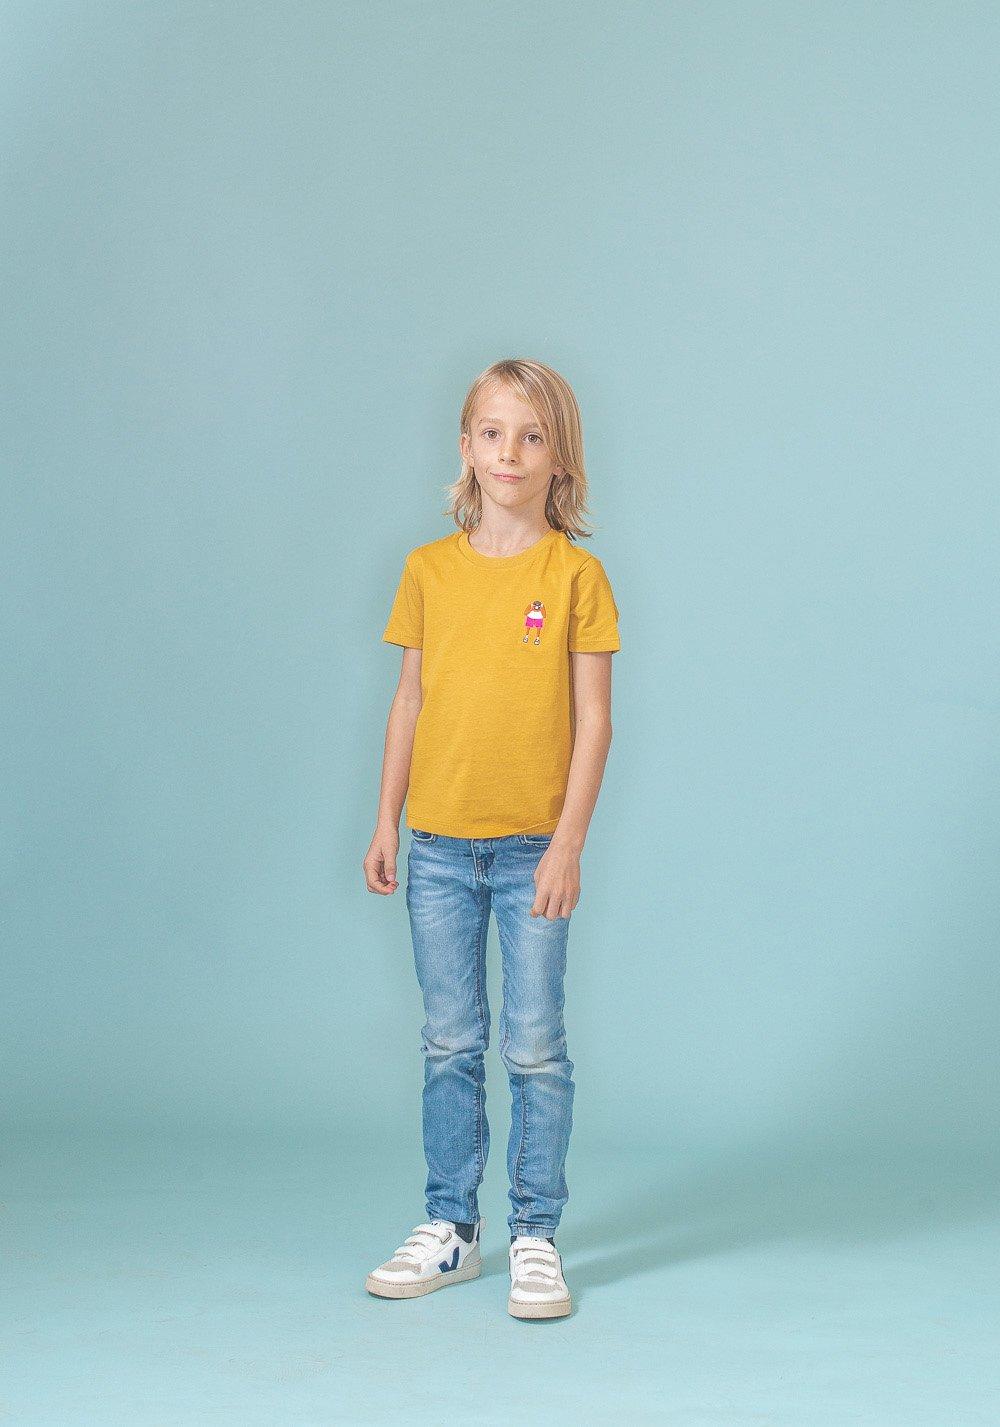 FRED + RHINO Kids Fat Tourist T-shirt